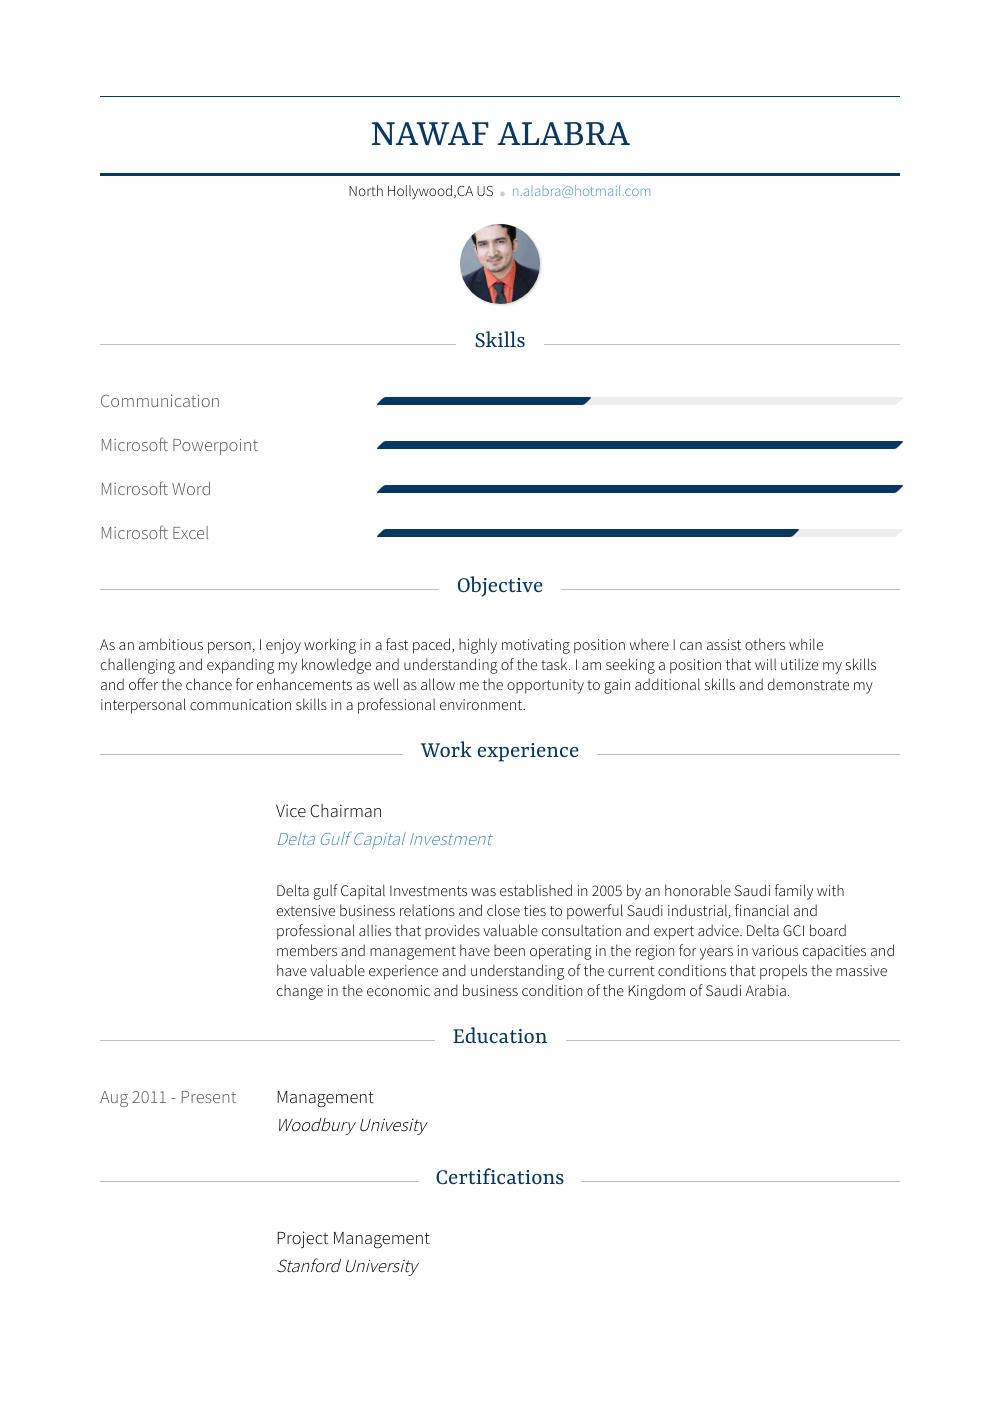 Vice Chairman Resume Sample